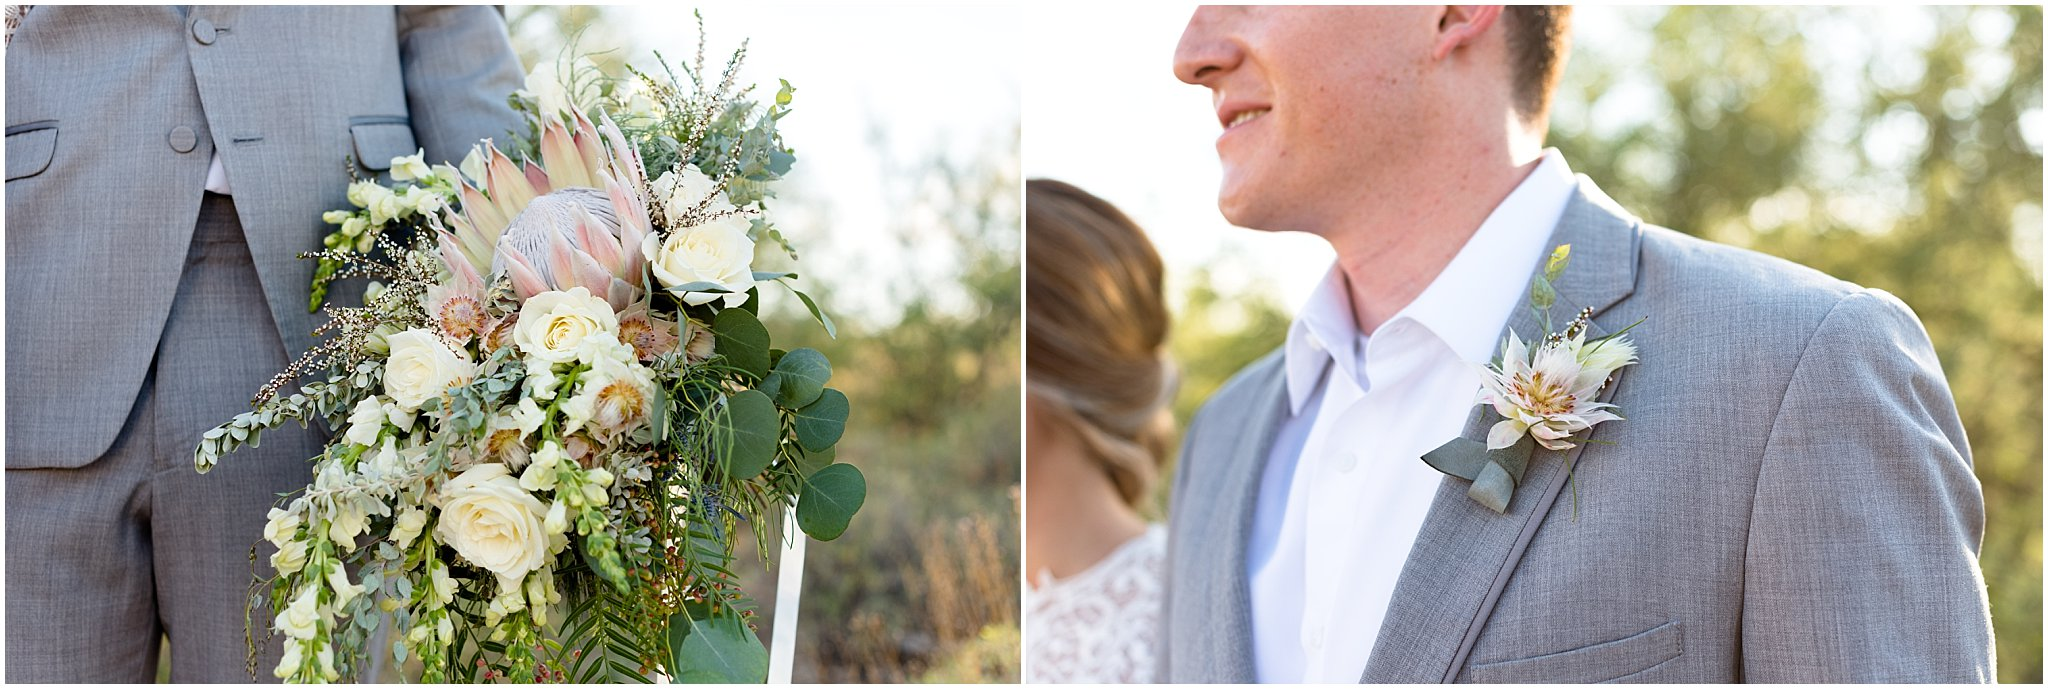 A Floral Note: Tucson Wedding Florist